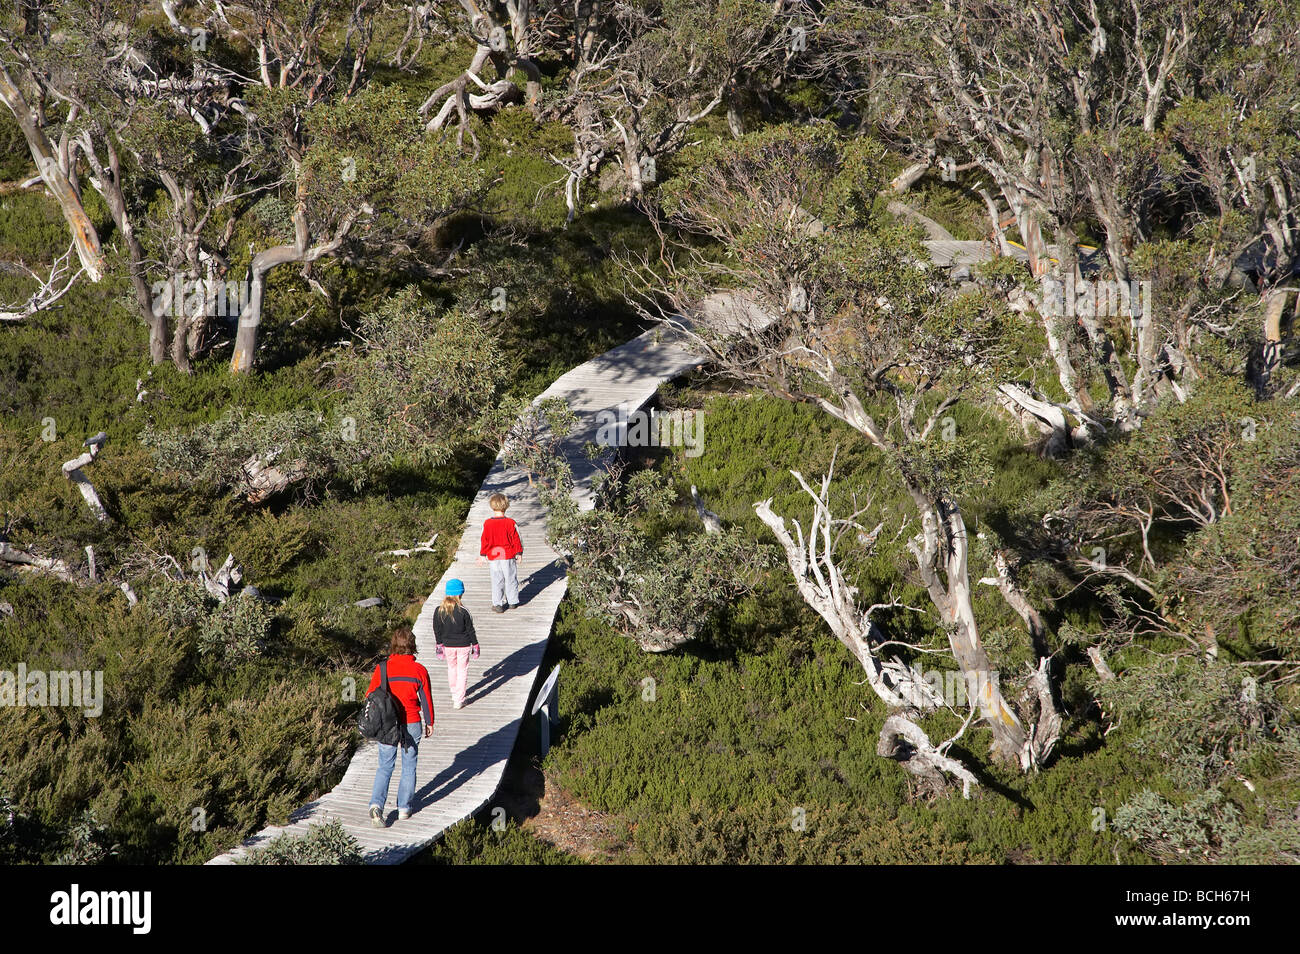 Family on Snow Gums Board Walk Charlotte Pass Kosciuszko National Park Snowy Mountains New South Wales Australia - Stock Image